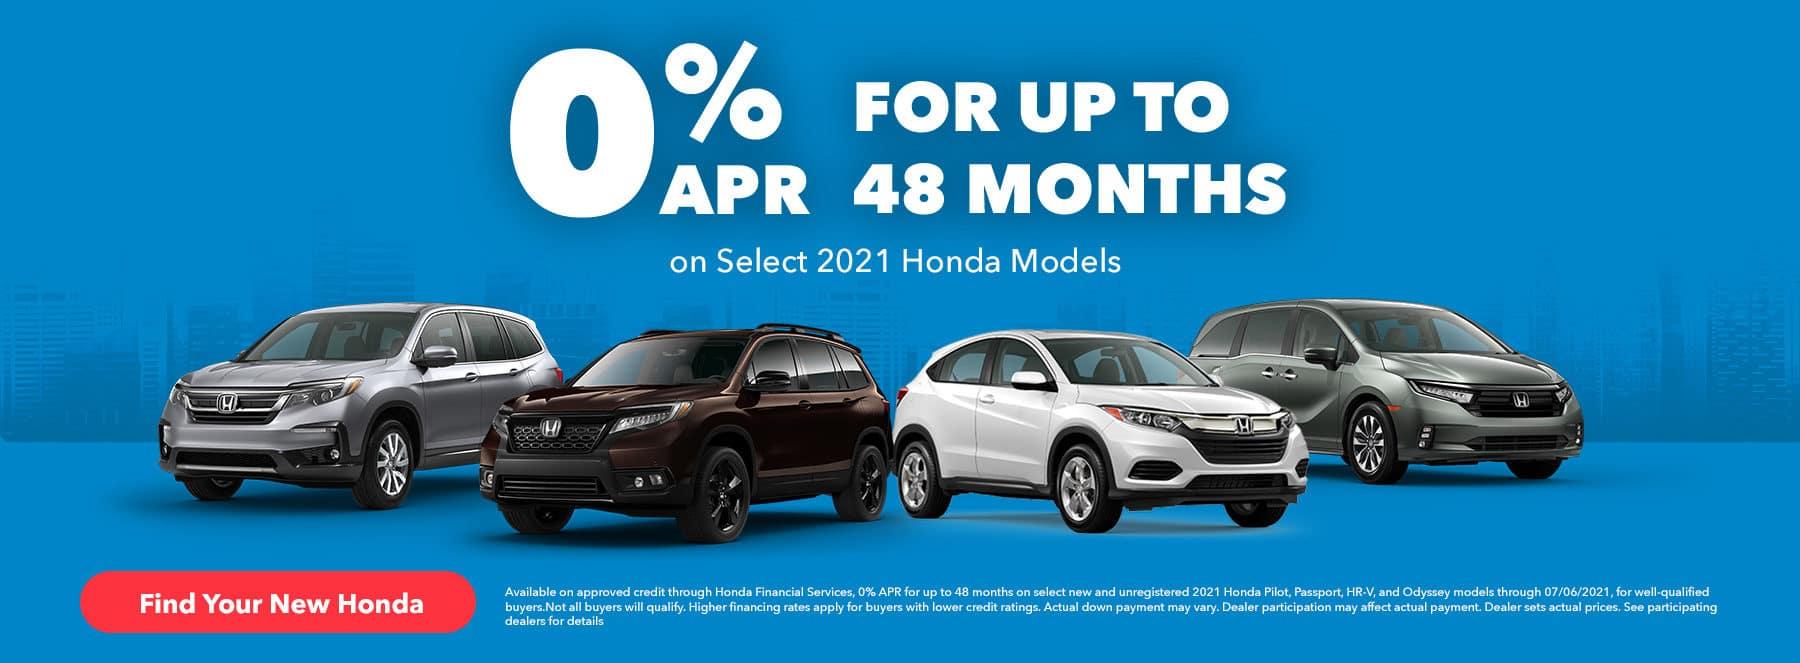 Harvest Honda 0% APR